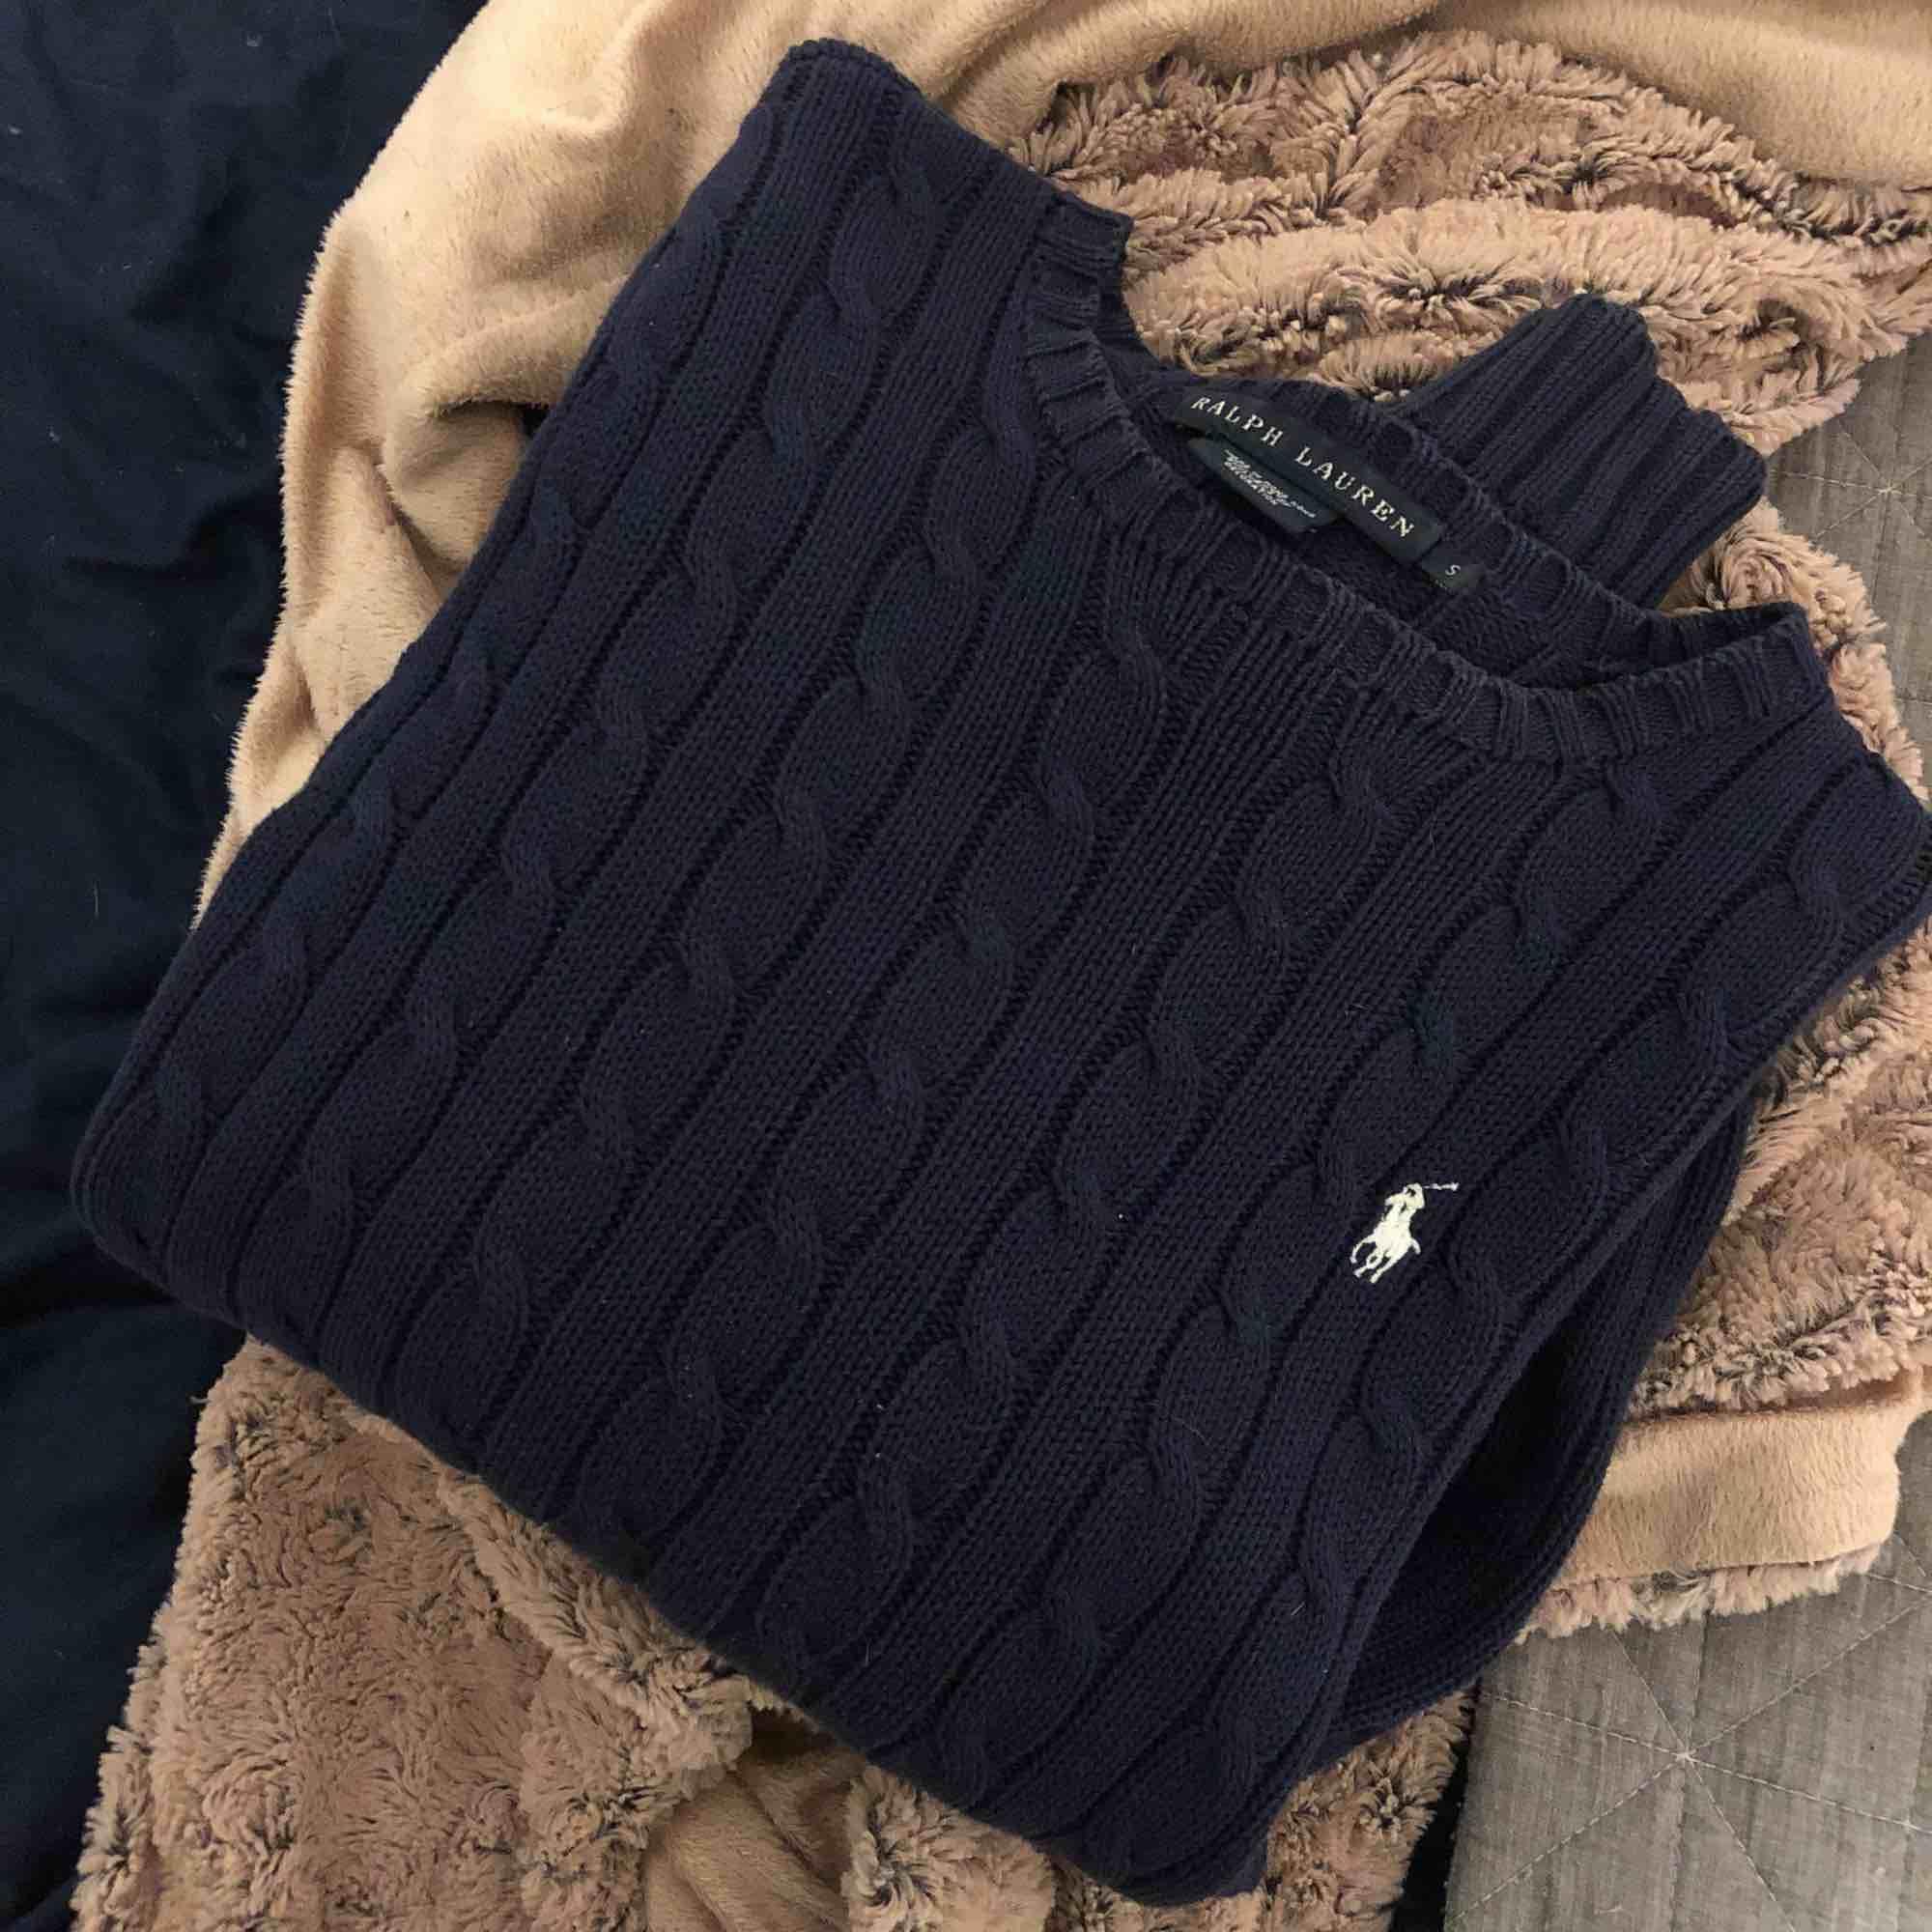 En äkta Ralph lauren kabelstickad tröja i storlek s.  Fraktar, tar emot swish. Priset är inklusive frakt:). Stickat.